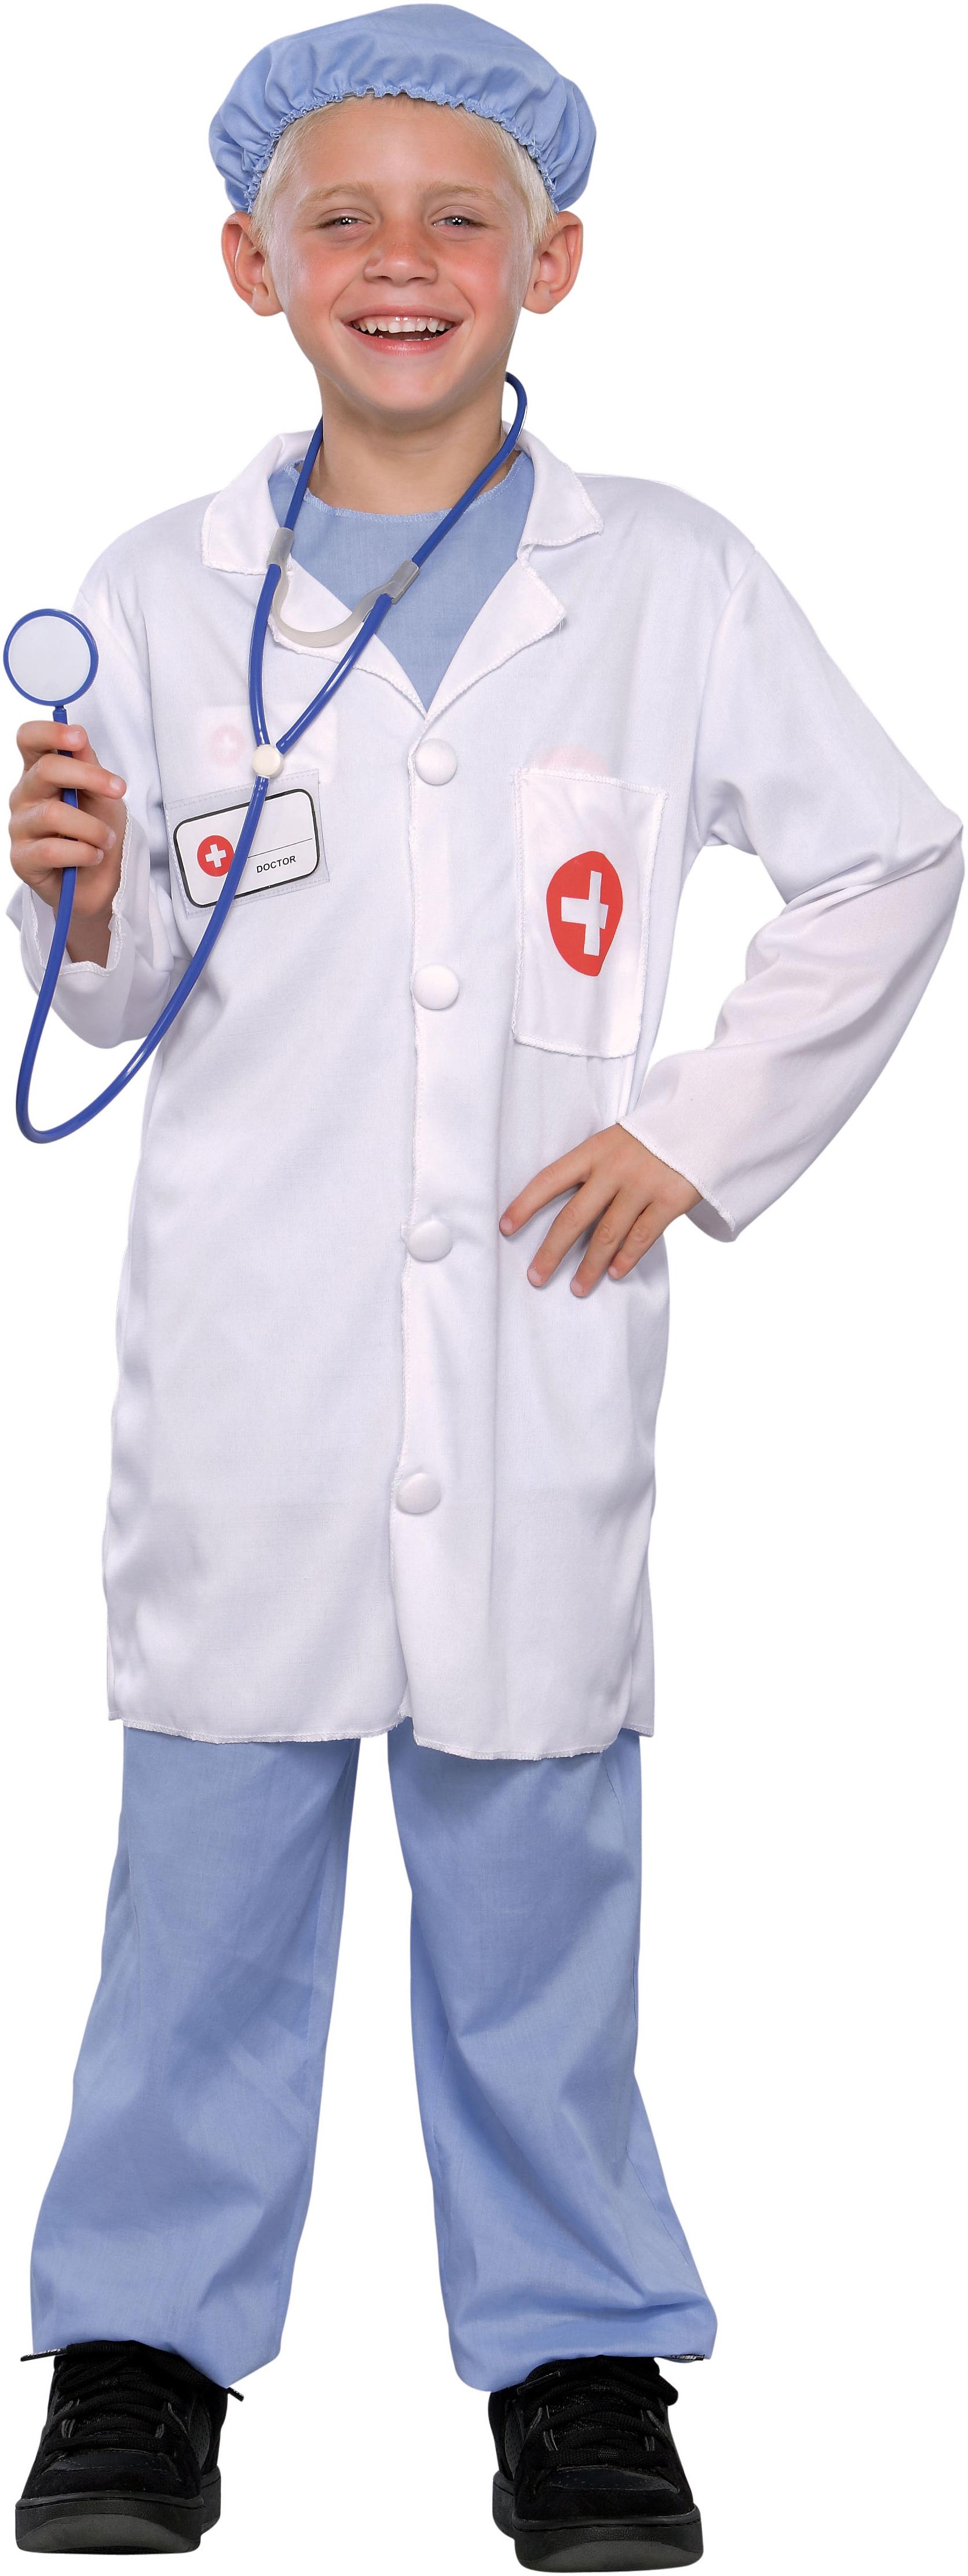 doctor kid Doctor Child Costume